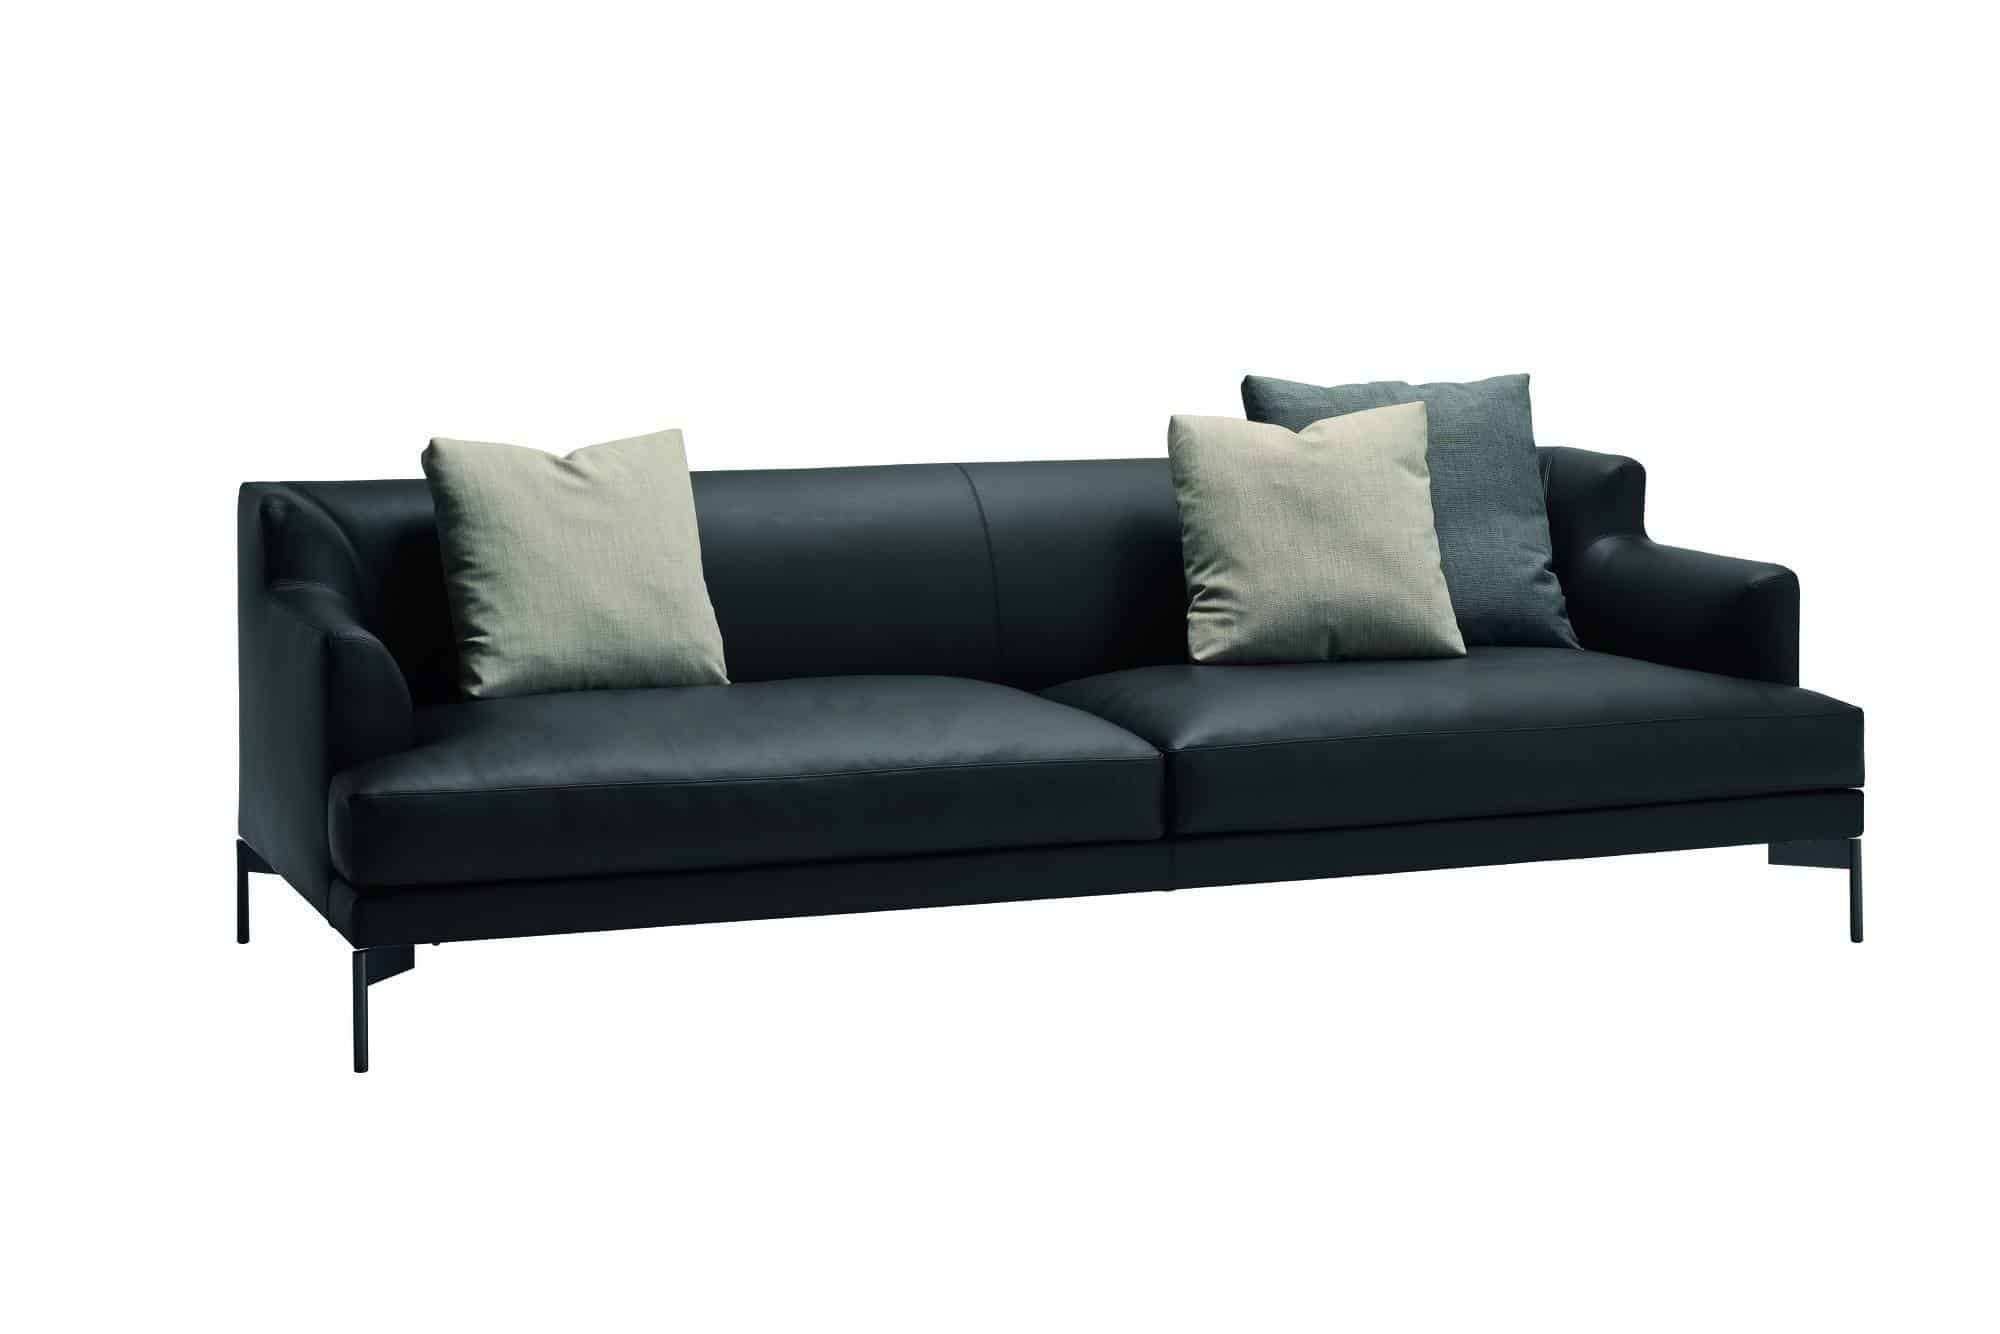 Frag Otis Collection Deigned By Dainellistudi Contemporary Designers Furniture Sofa Contemporary Furniture Design Furniture